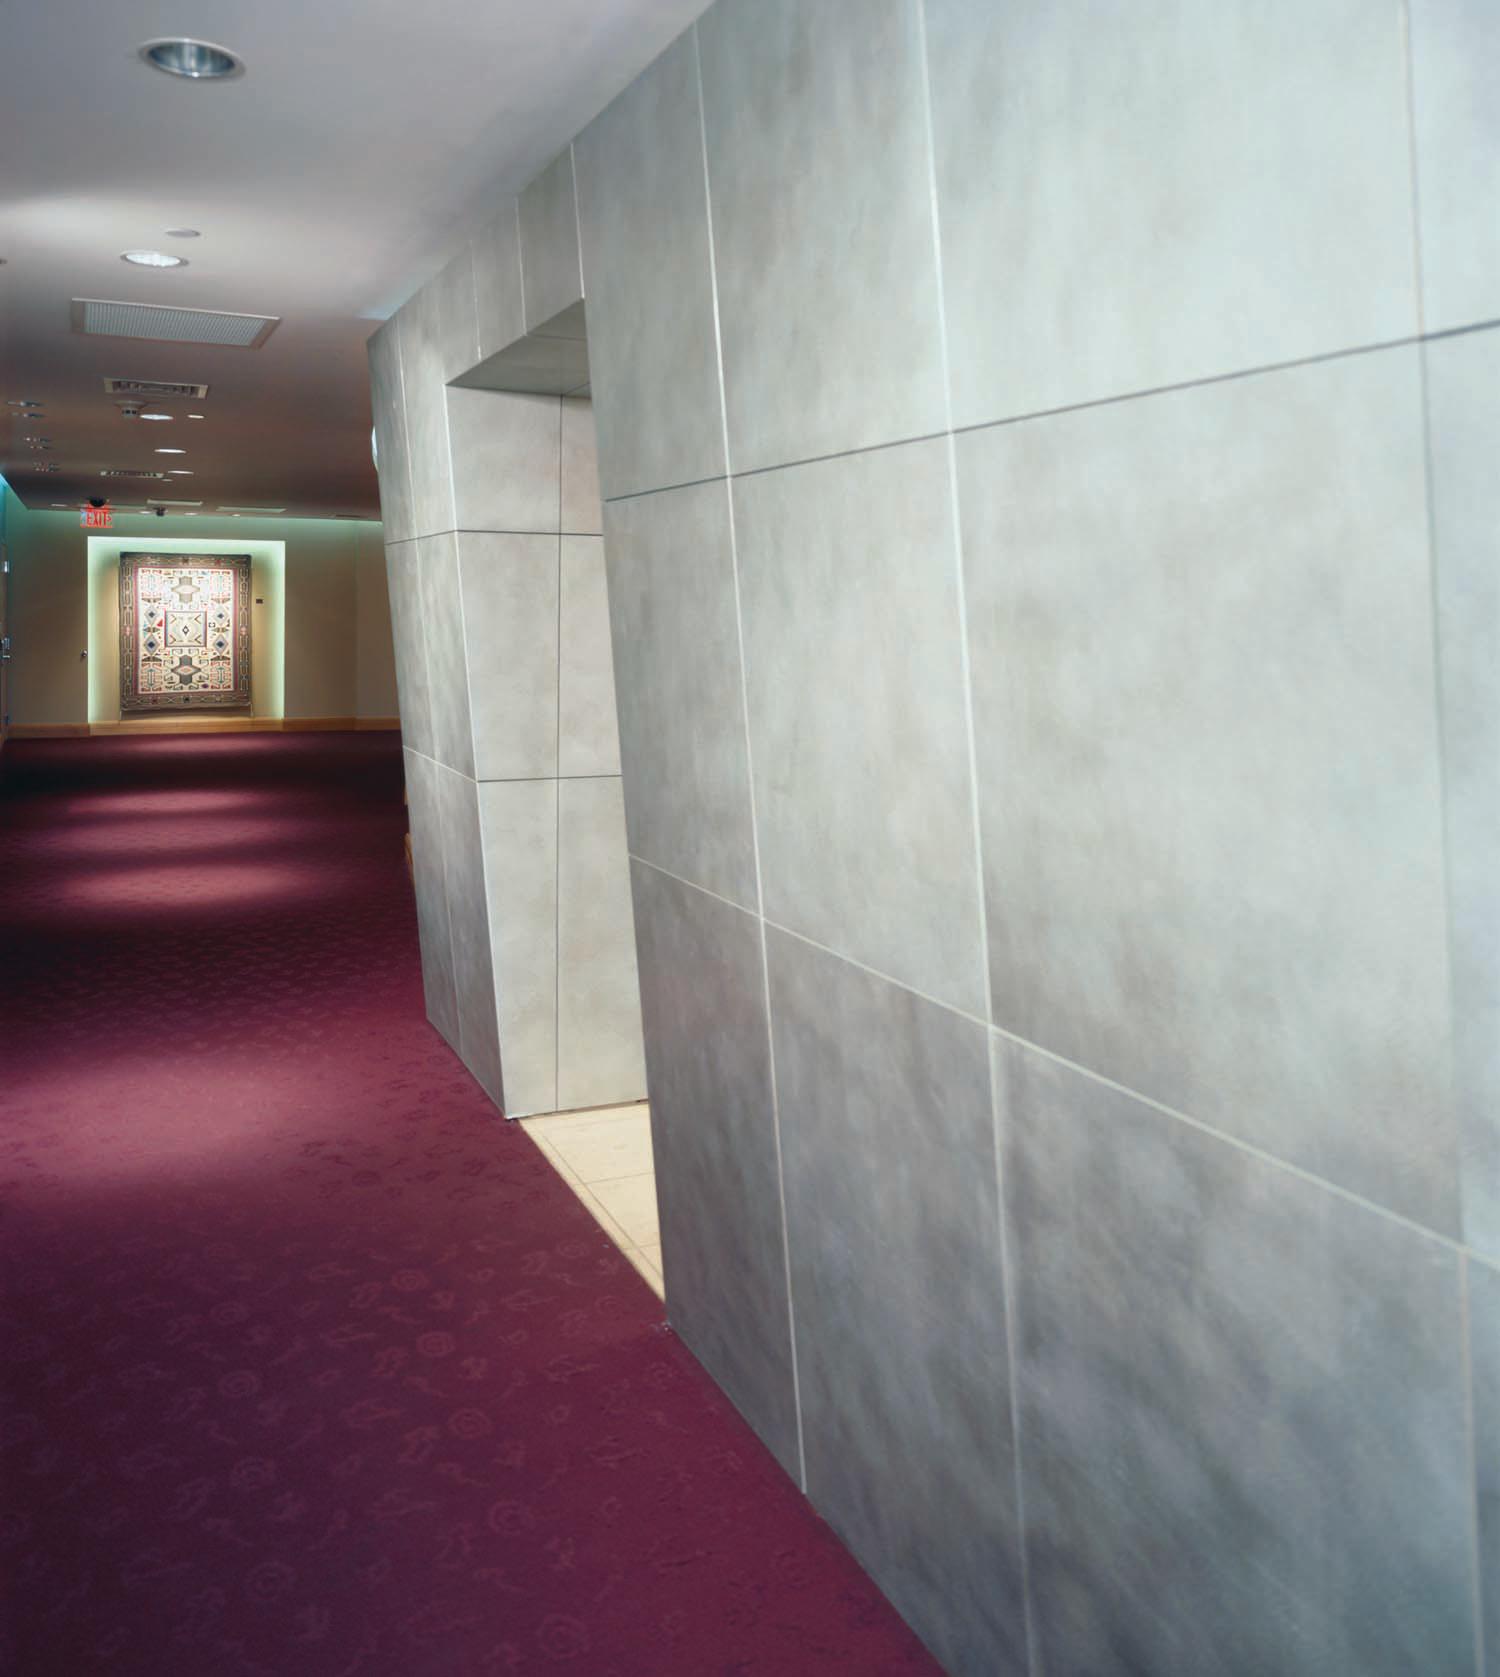 stollermetals-hallway.jpg